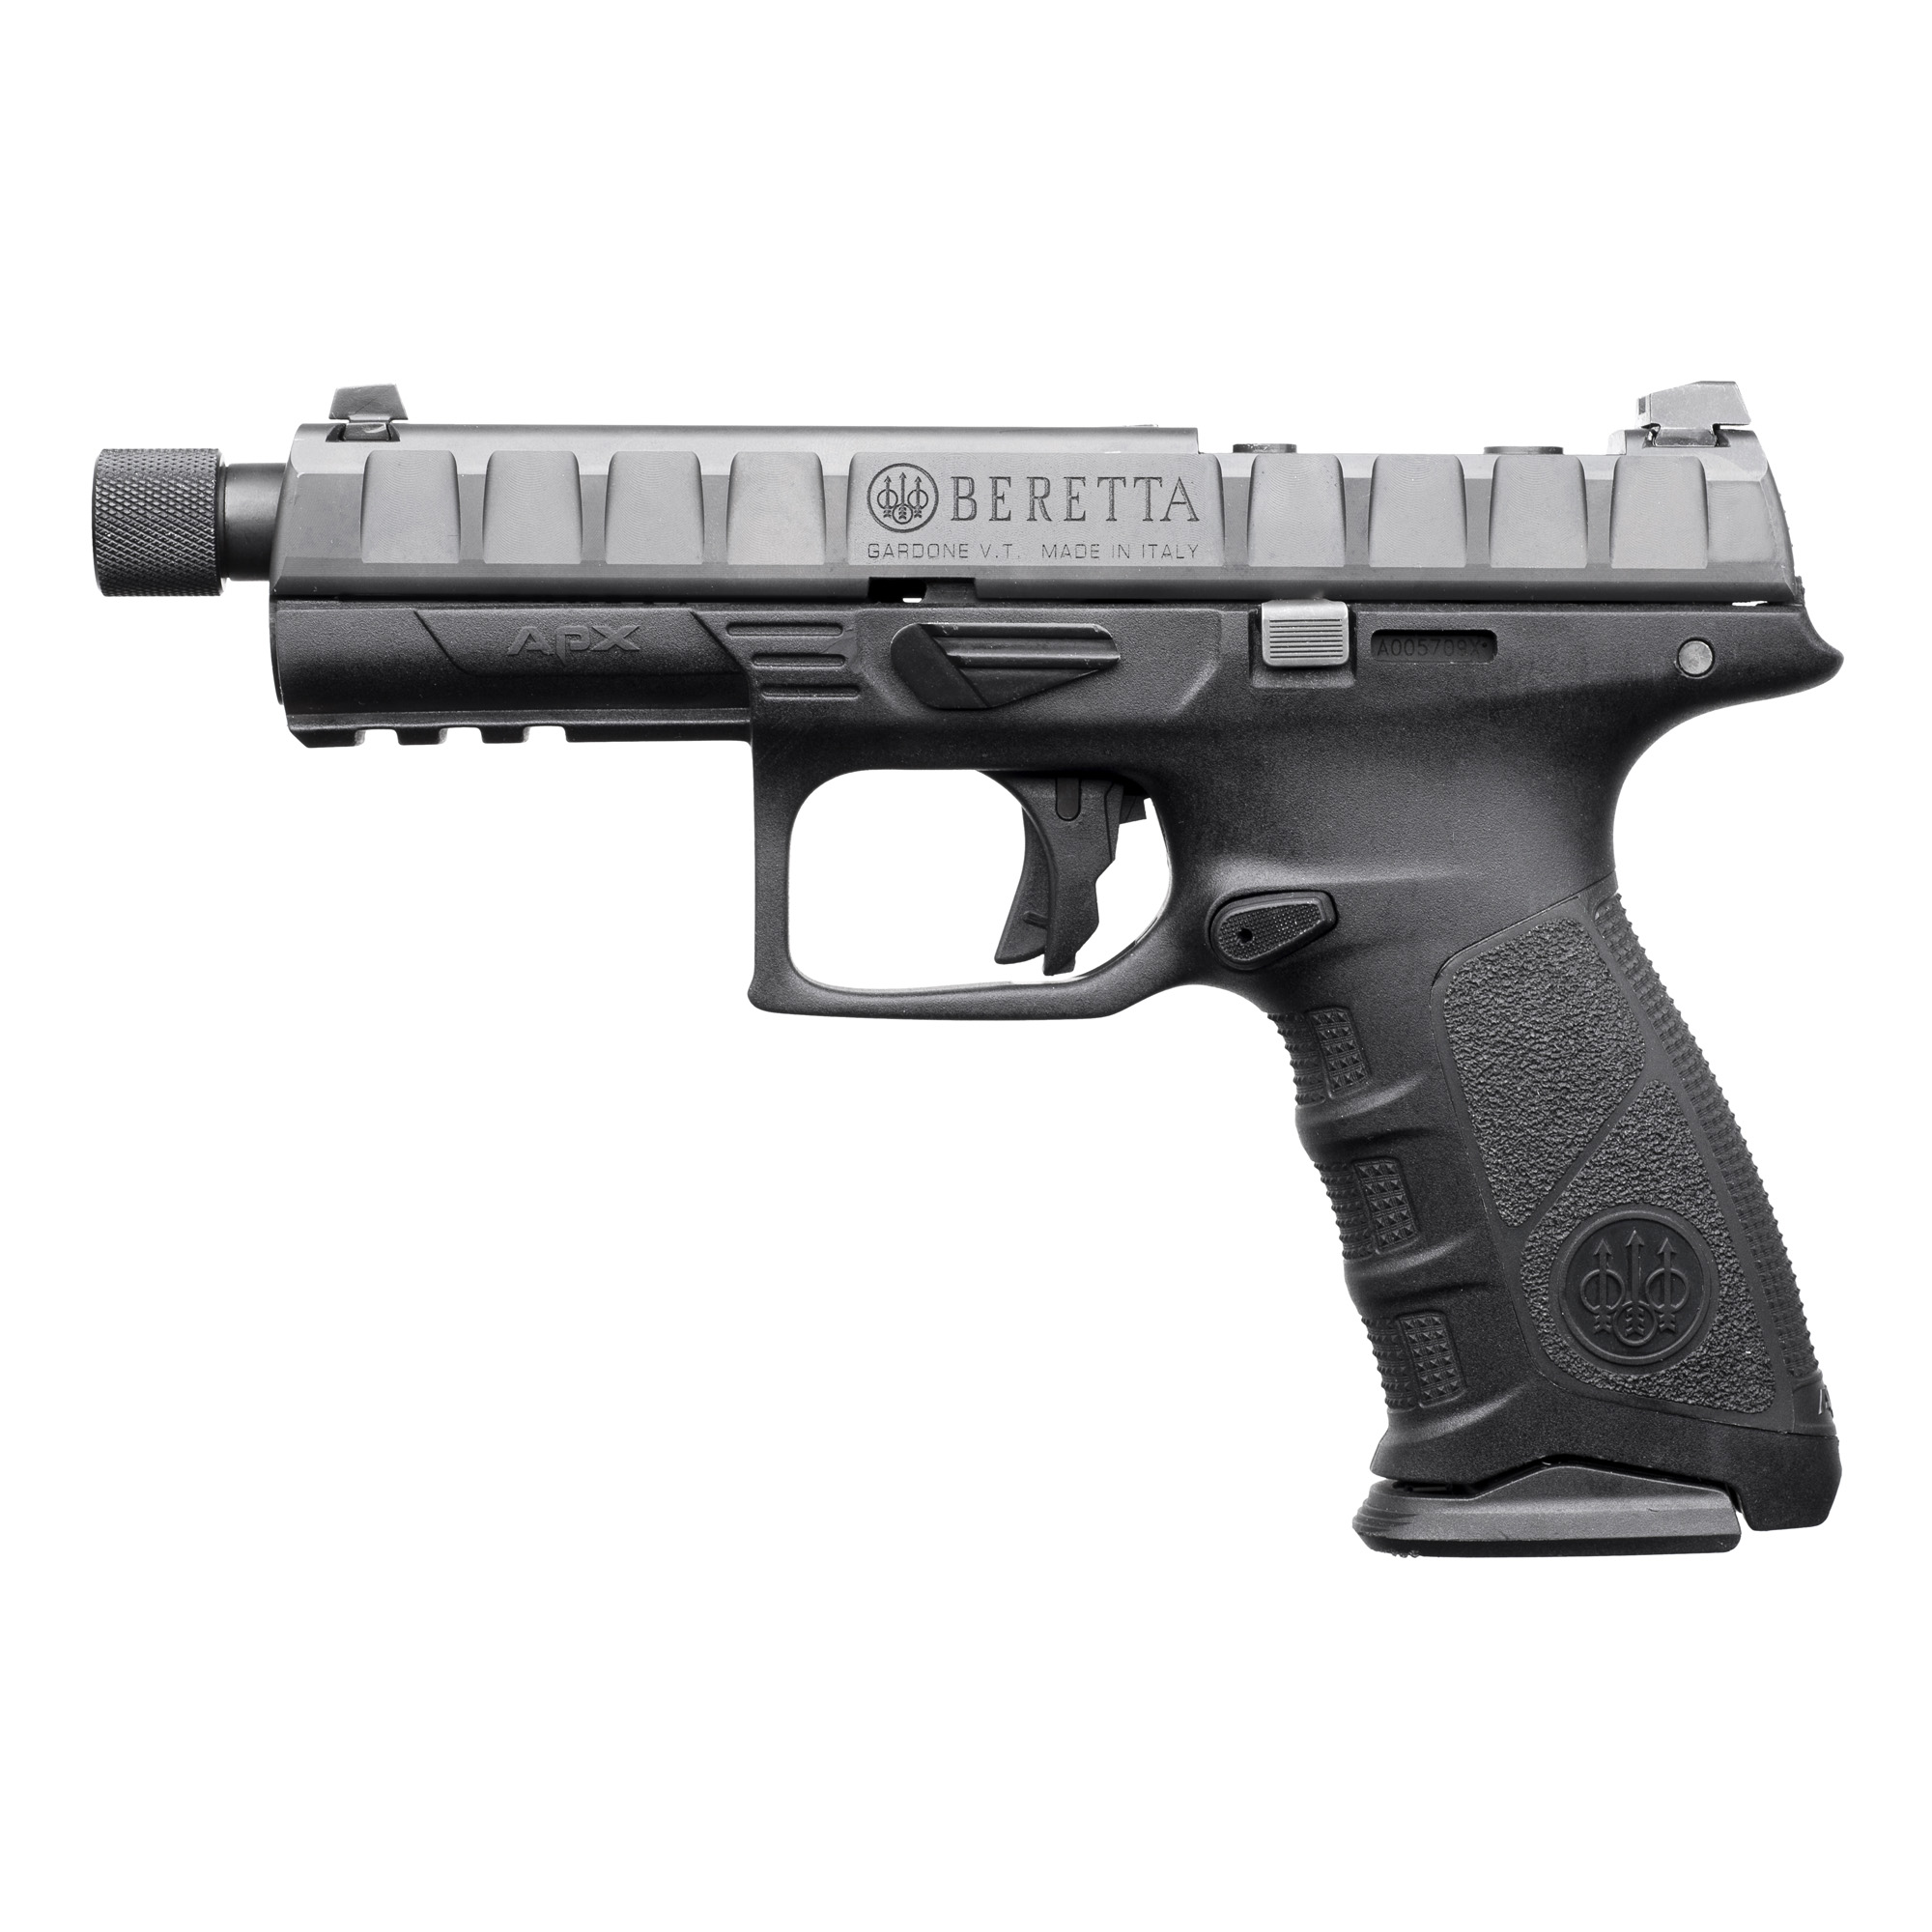 "Beretta Apx Combat 9mm 4.9"" Bl 17rd"